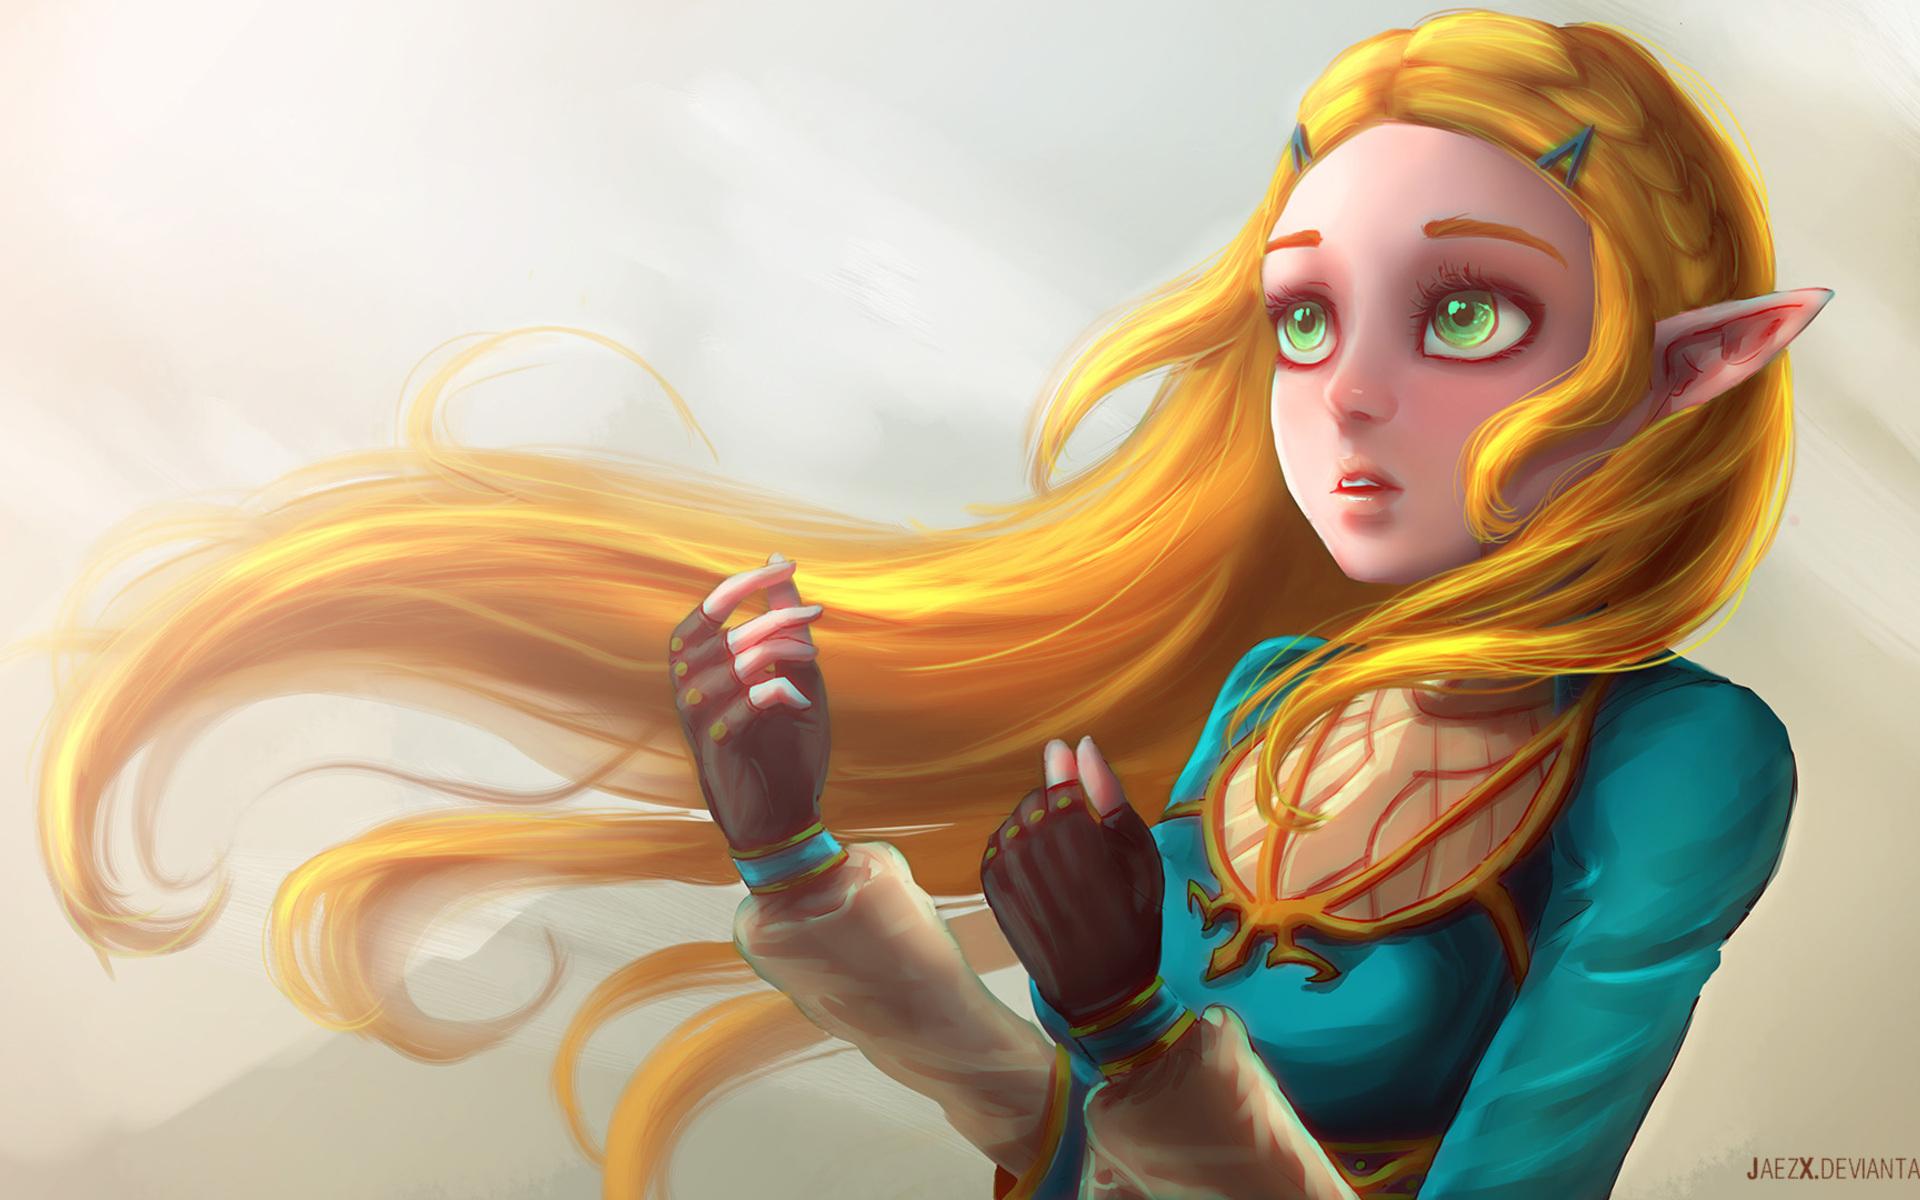 1920x1200 The Legend Of Zelda Breath Of The Wild Artwork 1080p